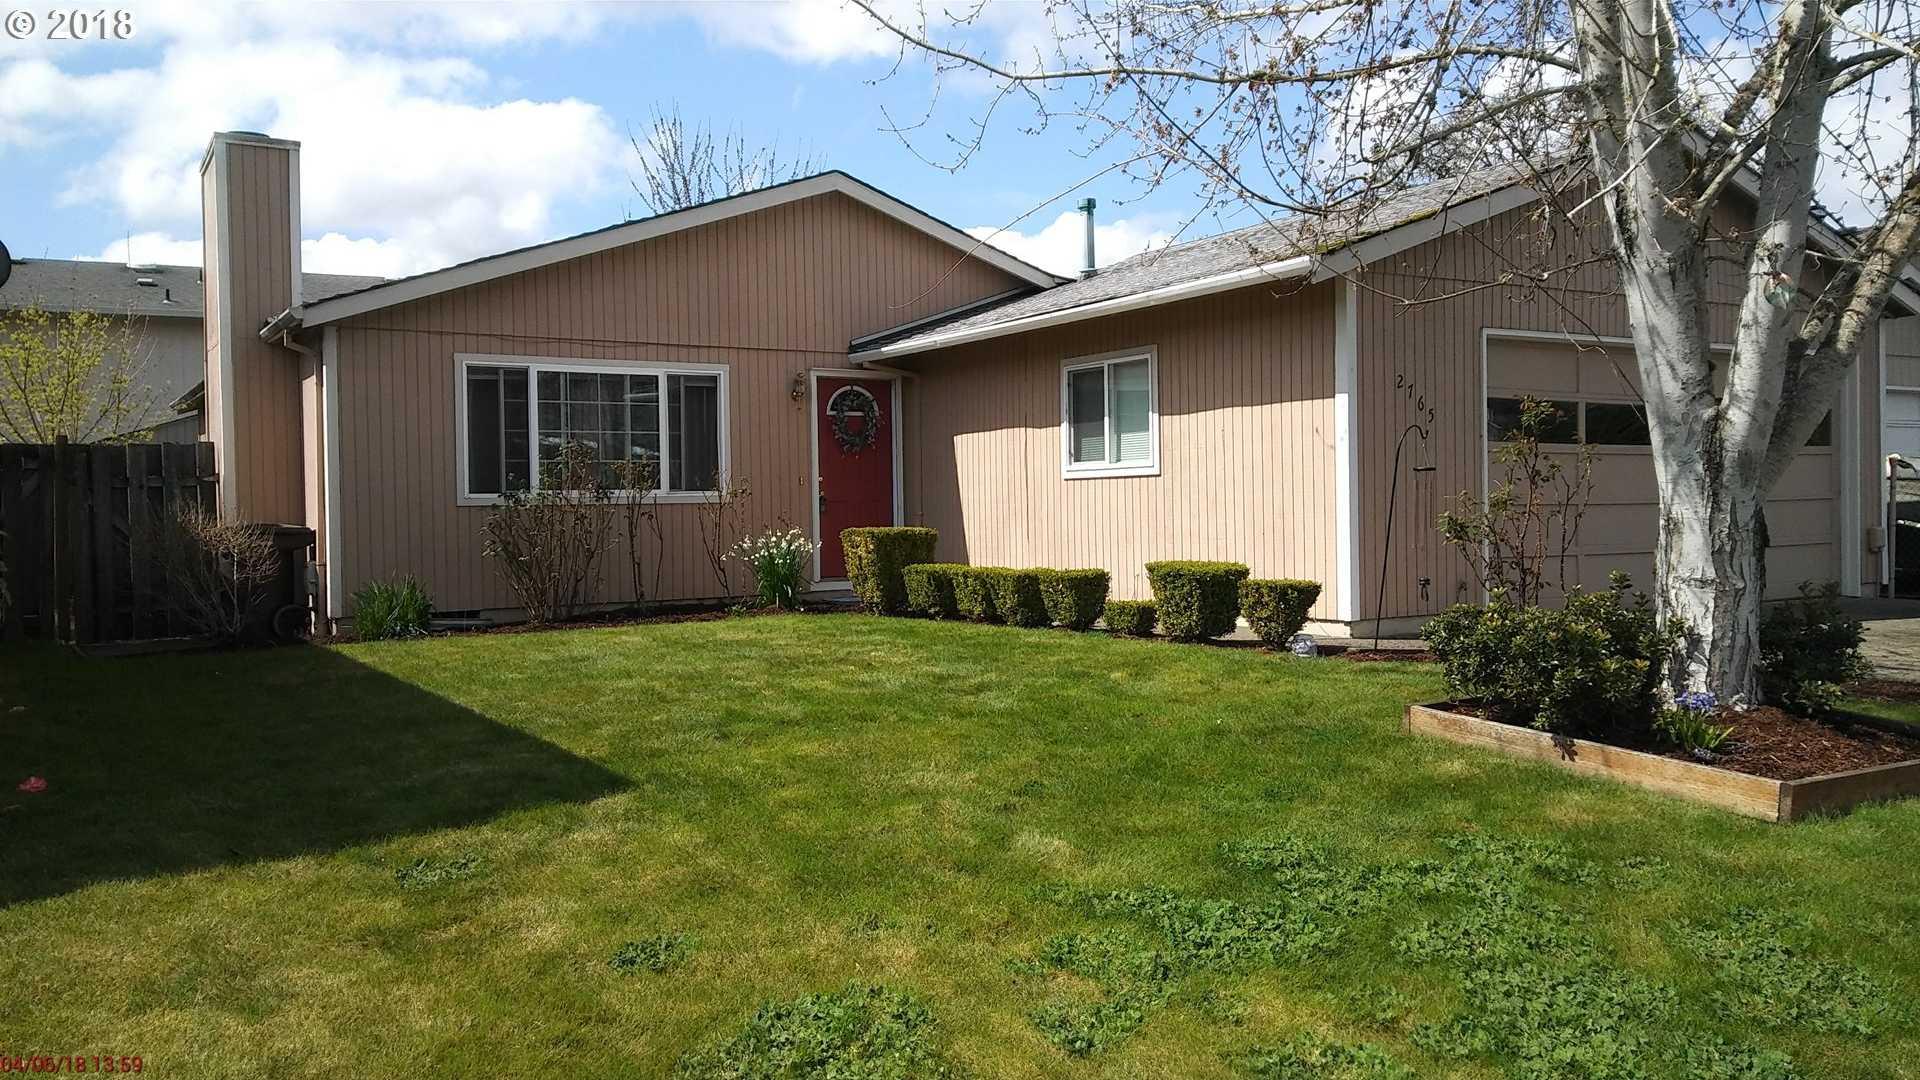 $295,000 - 3Br/2Ba -  for Sale in Hillsboro